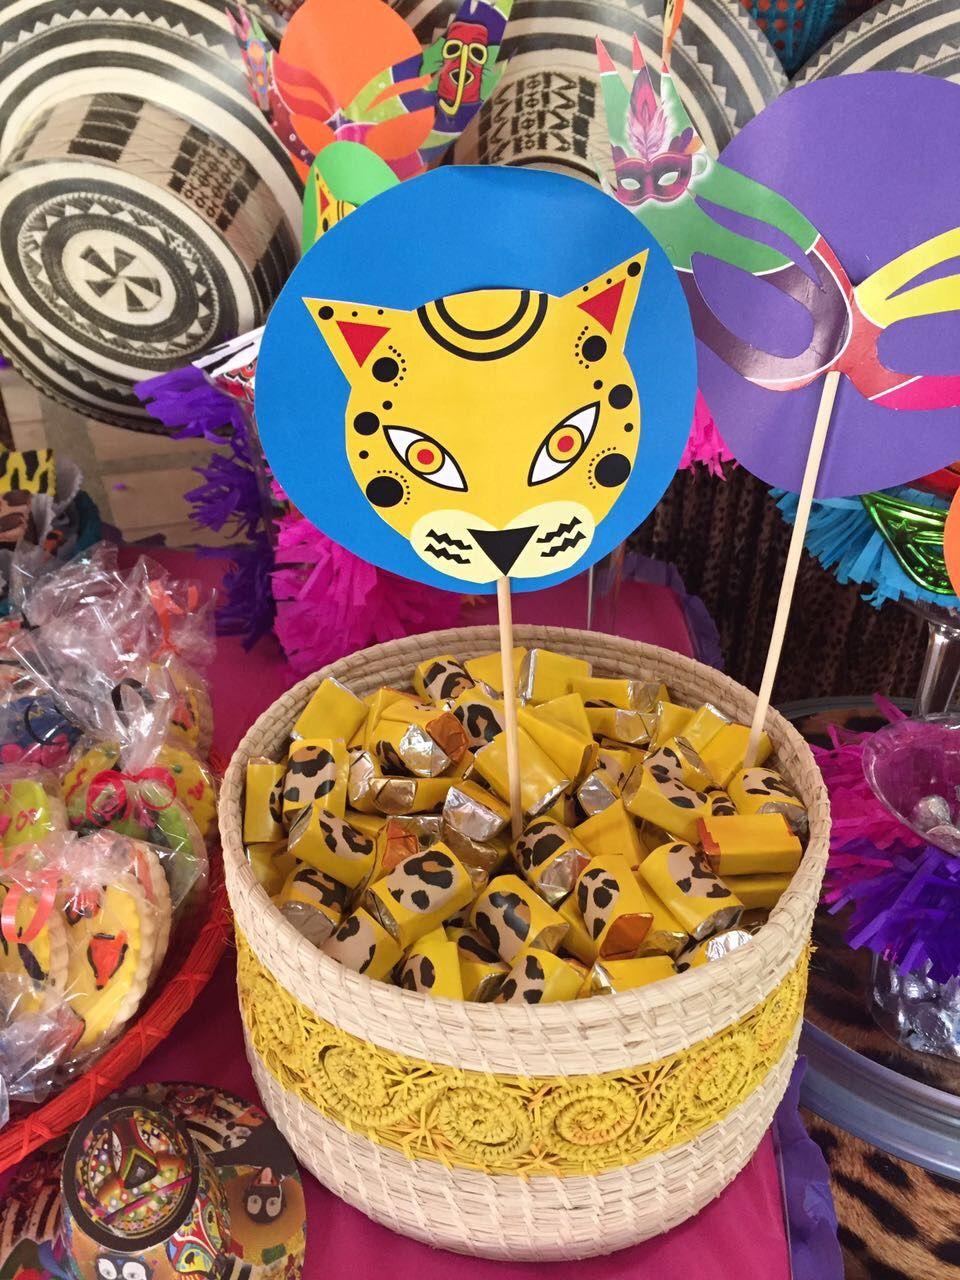 Pin De Vidafiestascg En Fiesta Carnaval De Barranquilla